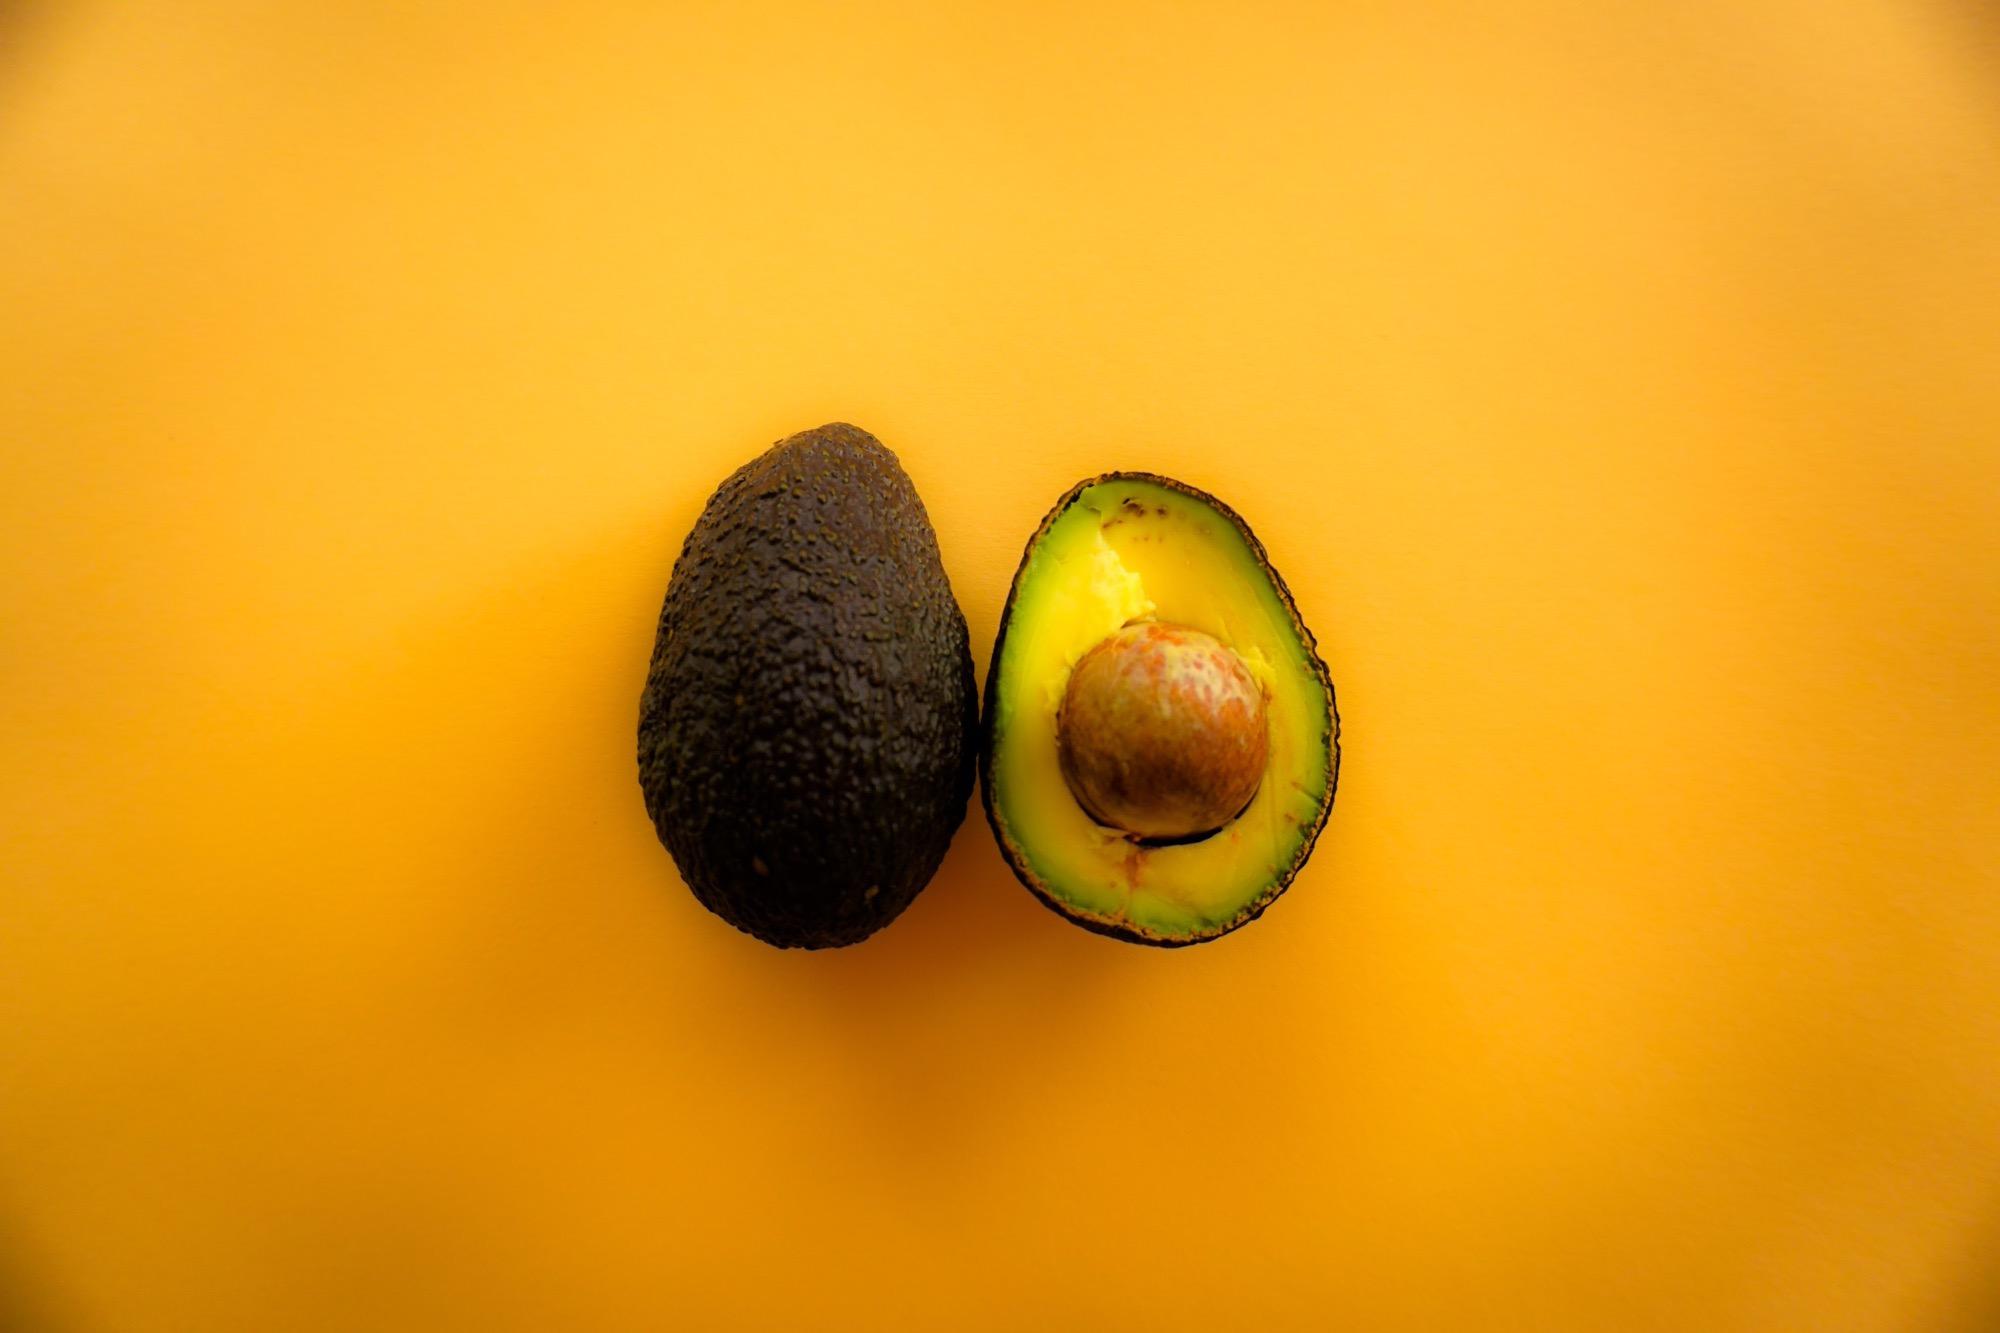 avocado3-1601652501.jpg